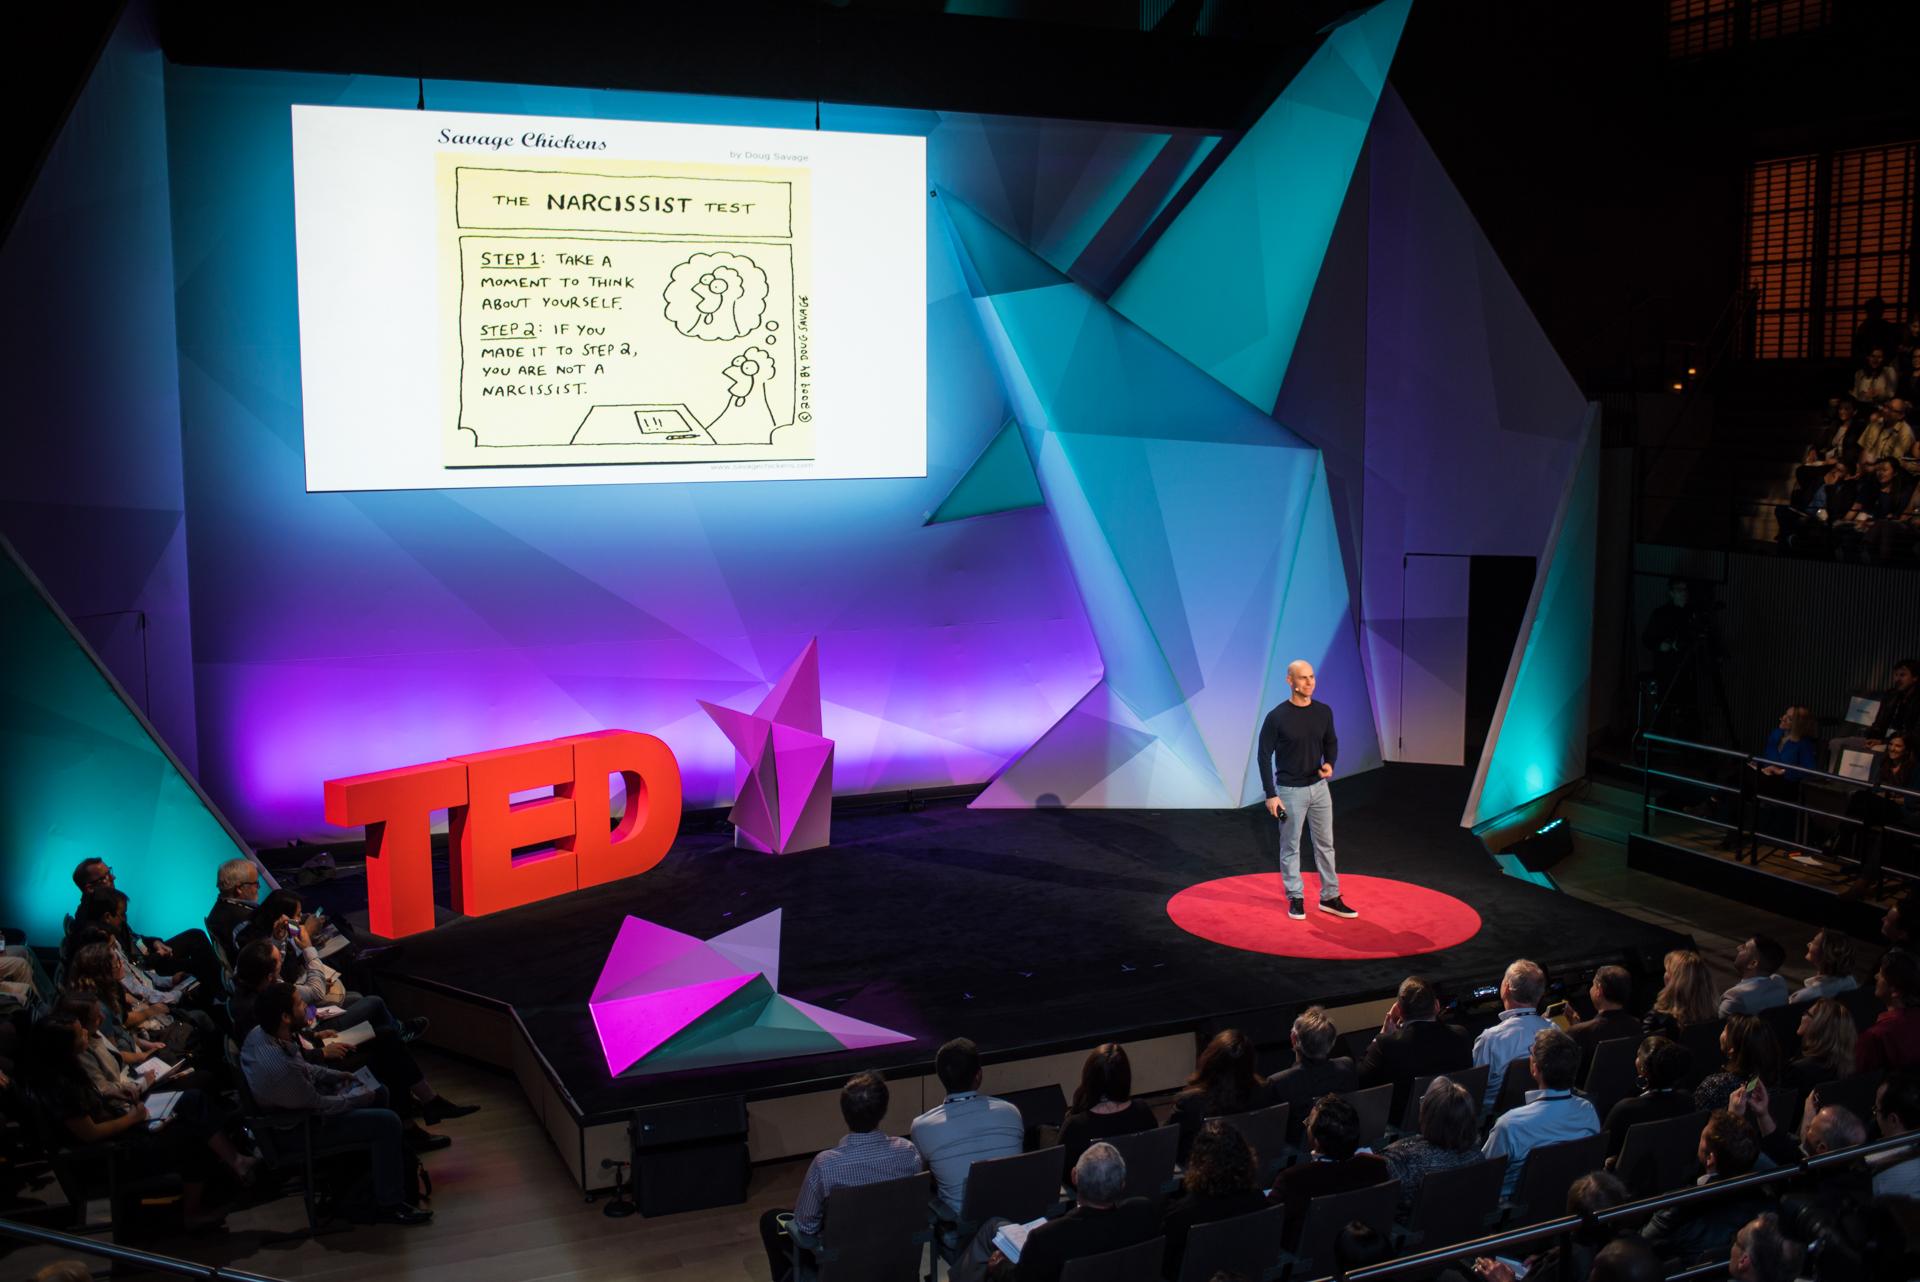 Adam Grant speaks at TED@IBM salon - Spark, November 16, 2016, San Francisco Jazz, San Francisco, California. Photo: Russell Edwards/TED